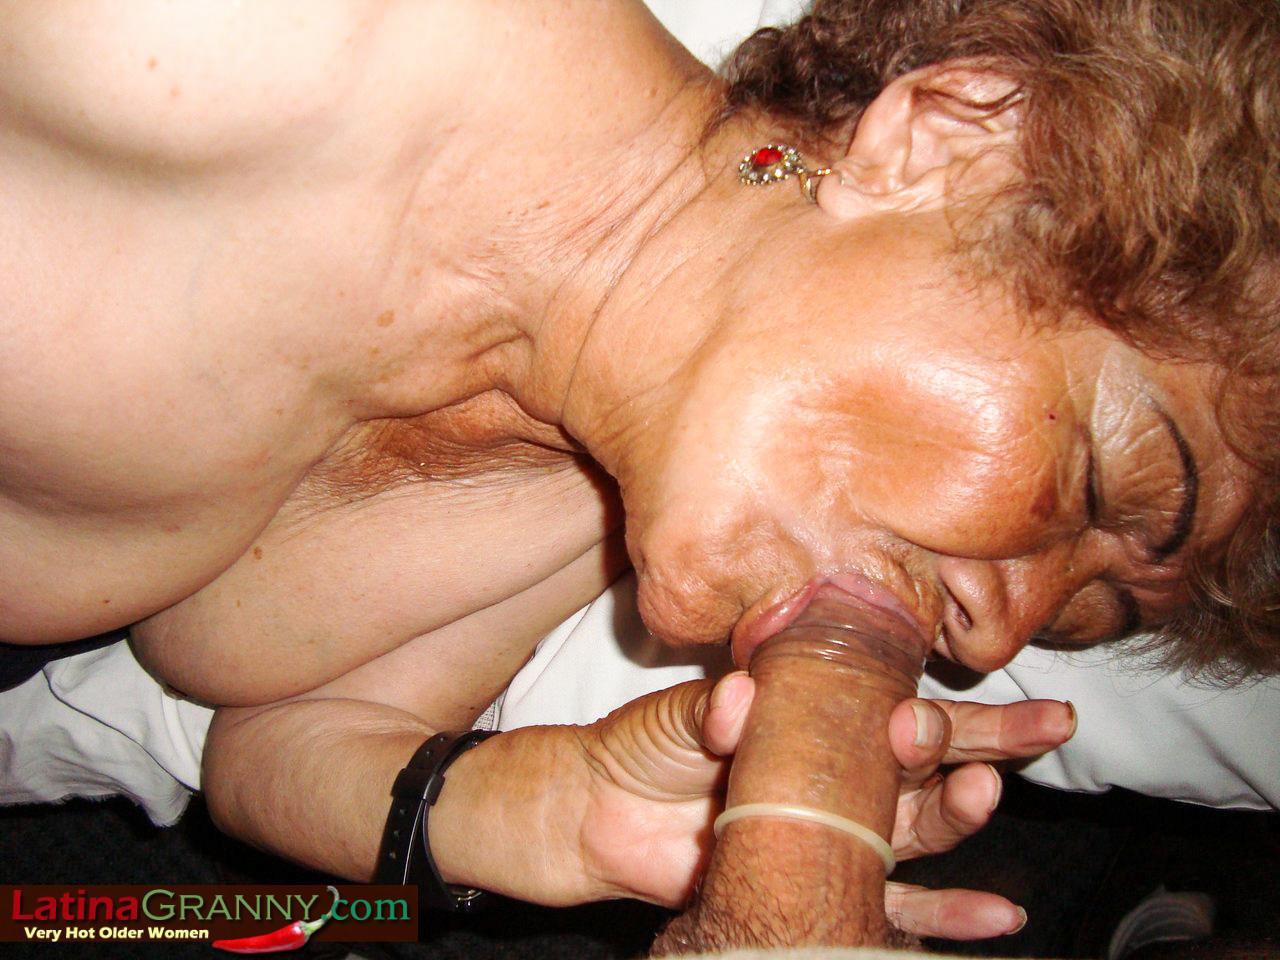 Granny sexforum